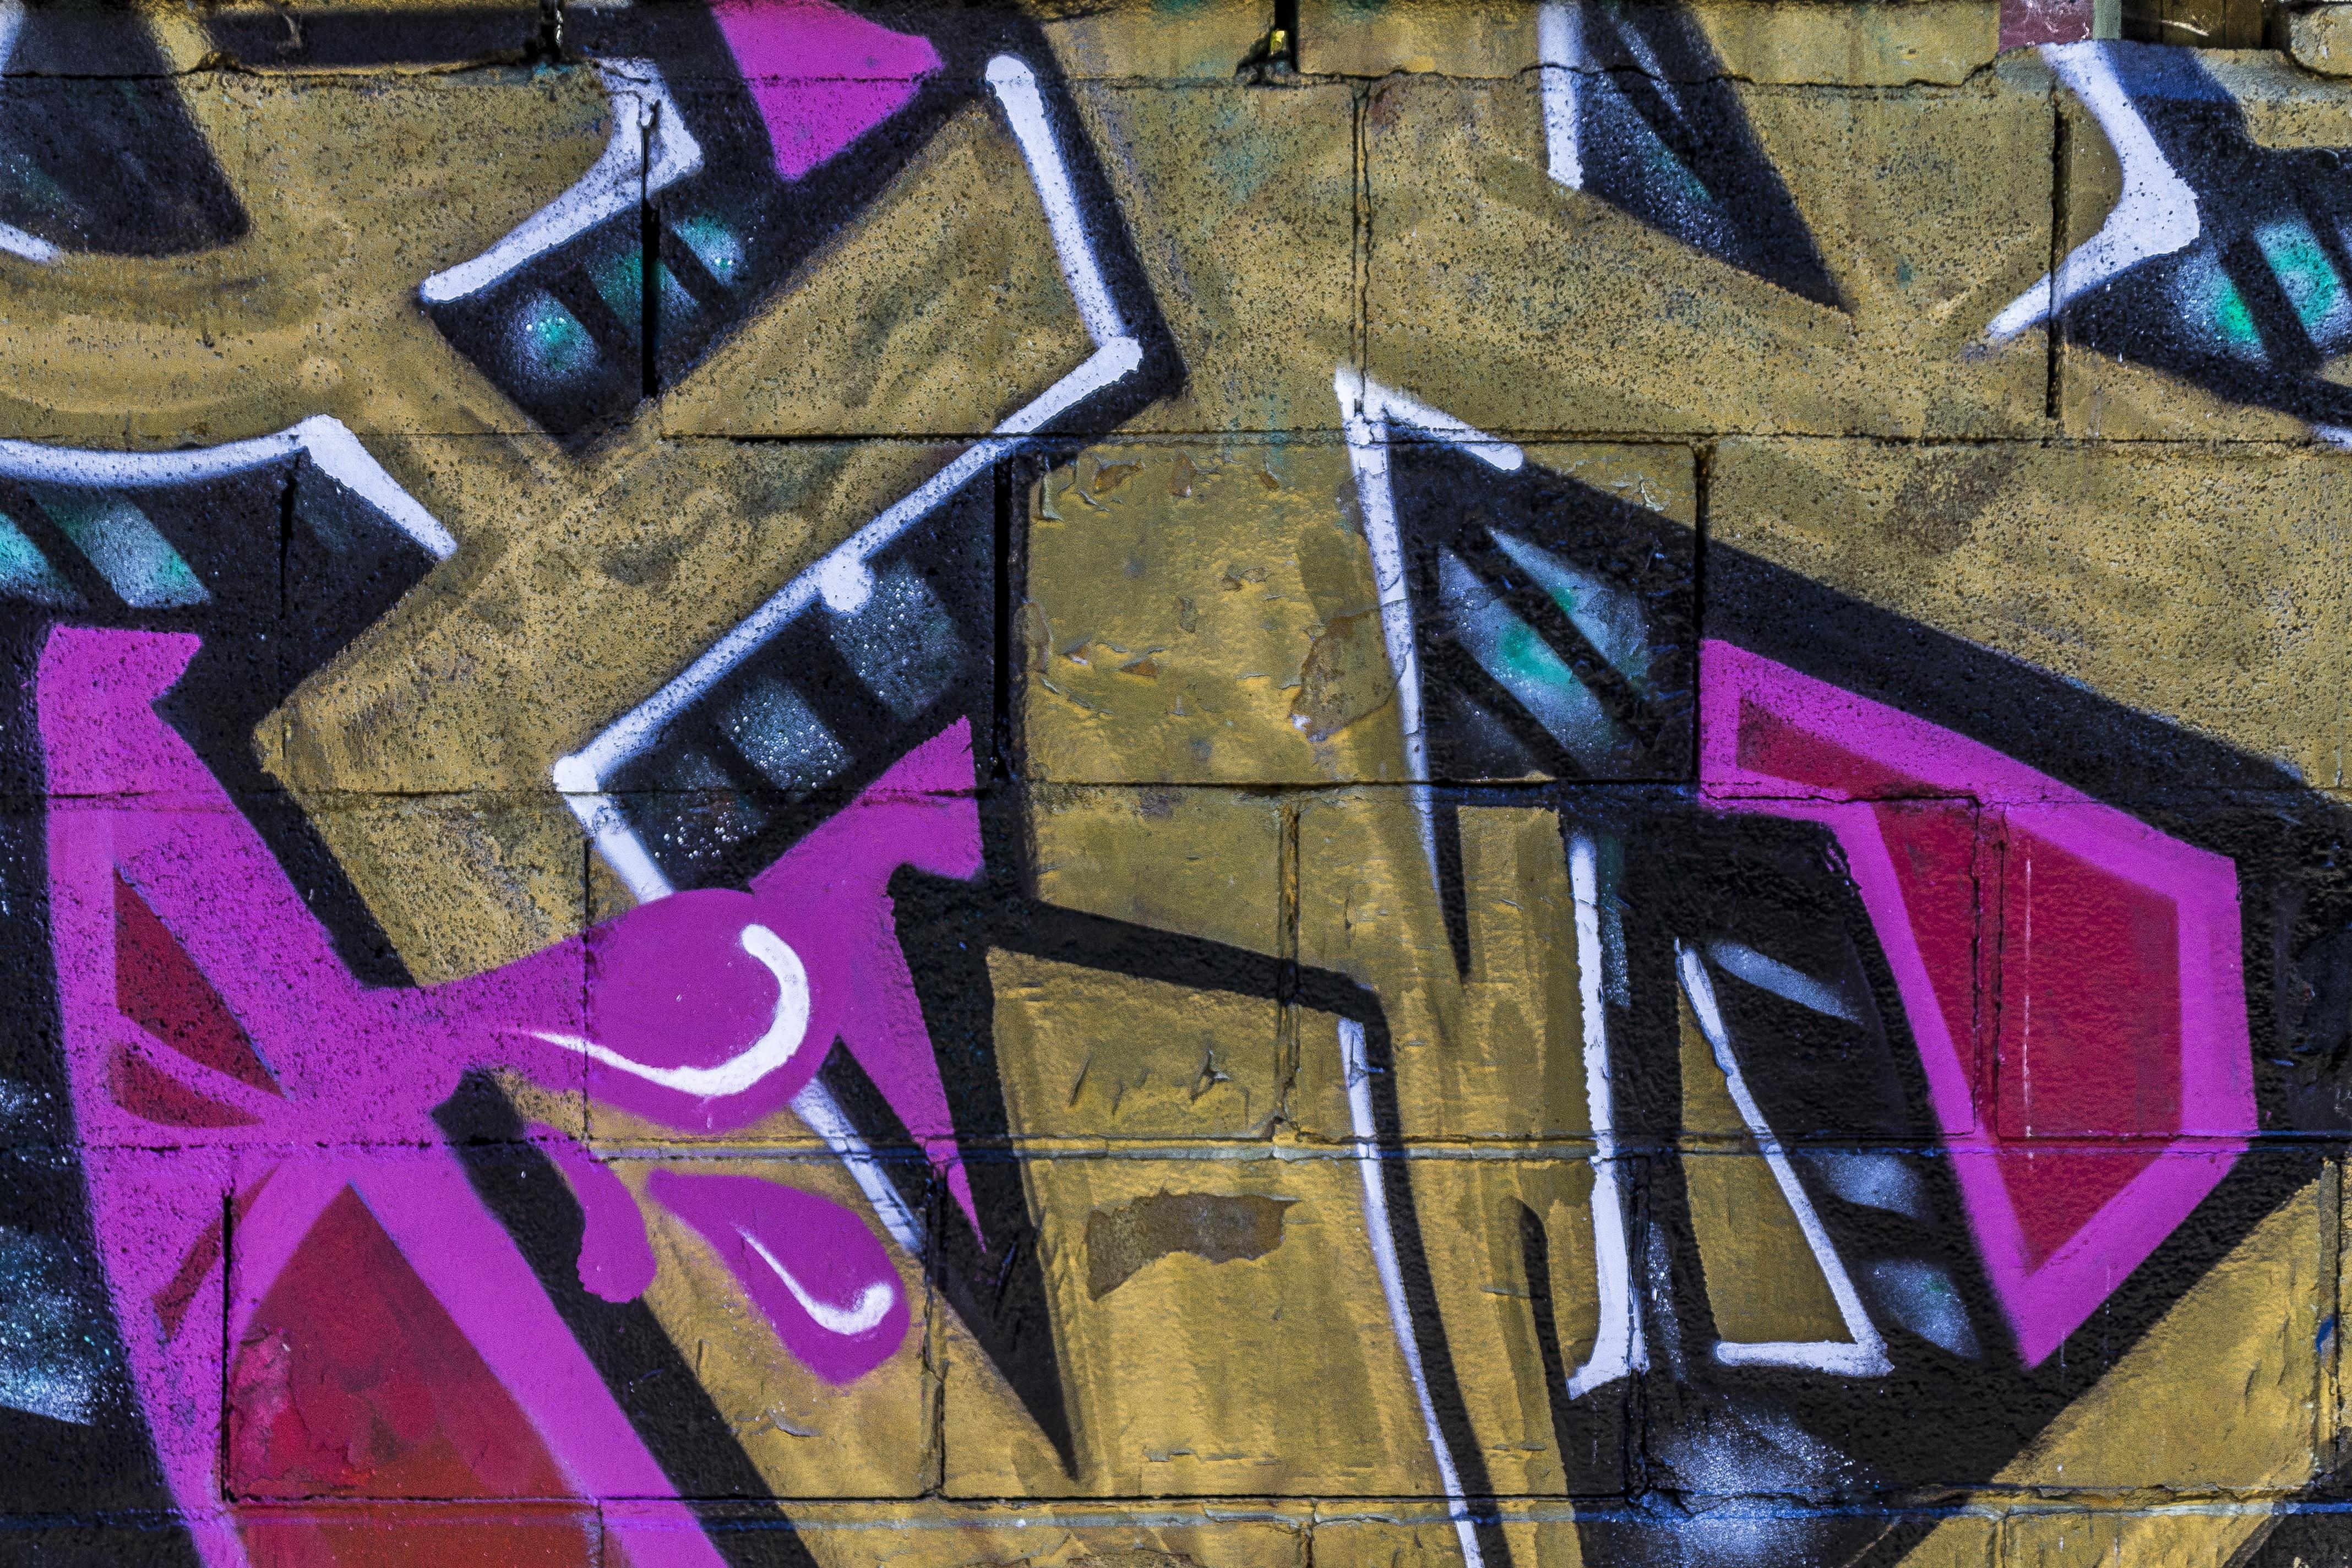 Graffiti art background - Abstract City Urban Wall Color Artistic Grunge Brick Graffiti Brick Wall Street Art Art Background Mural